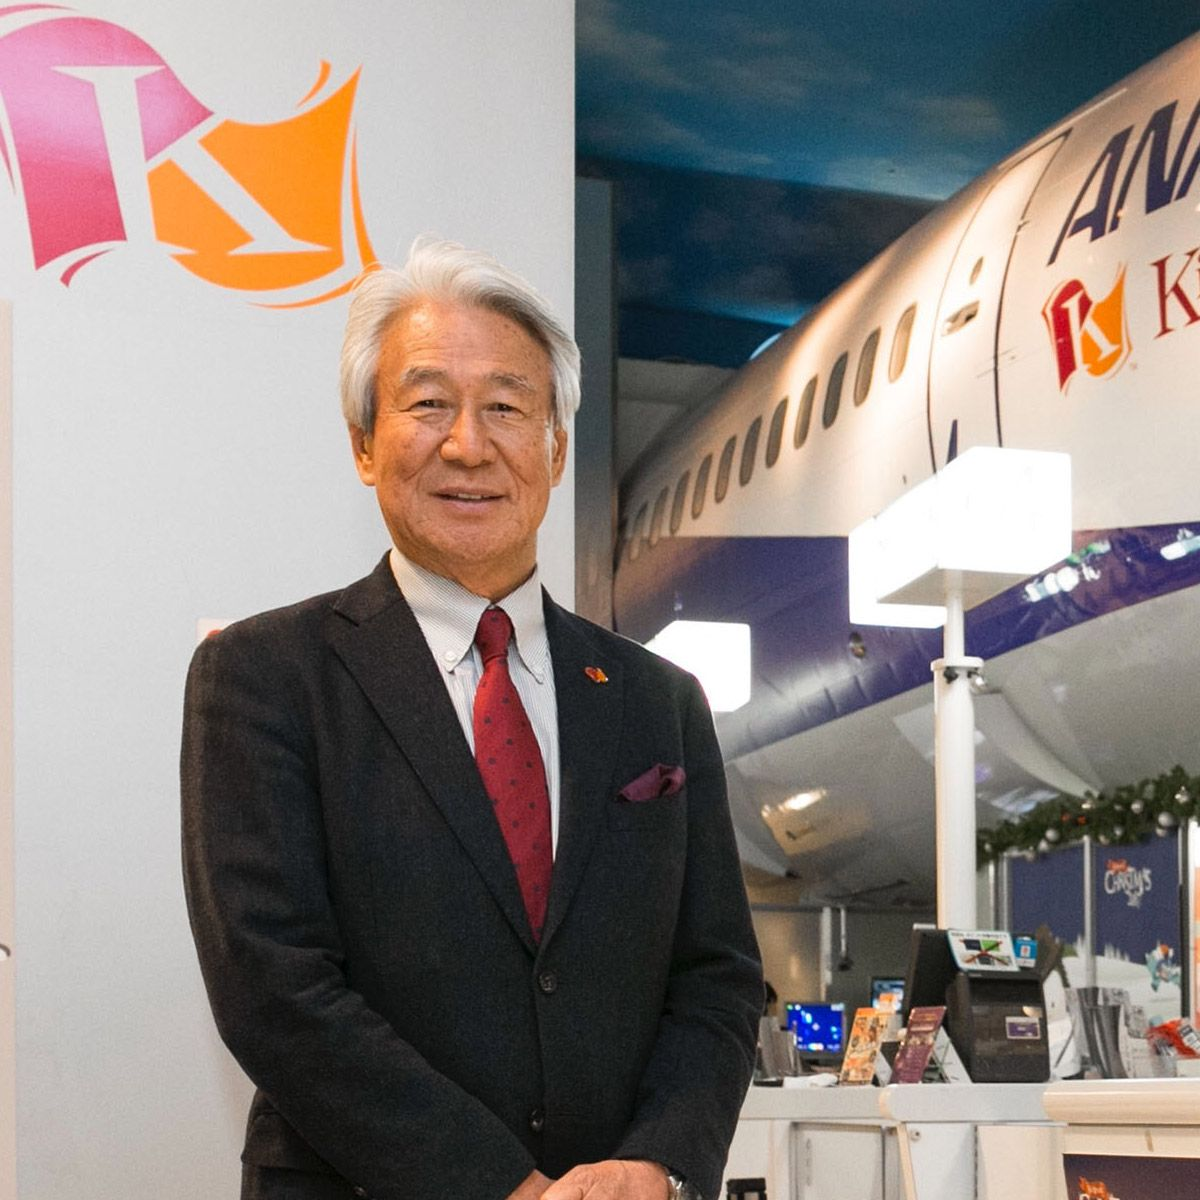 KCJ GROUP 株式会社 代表取締役社長兼CEO 住谷栄之資氏